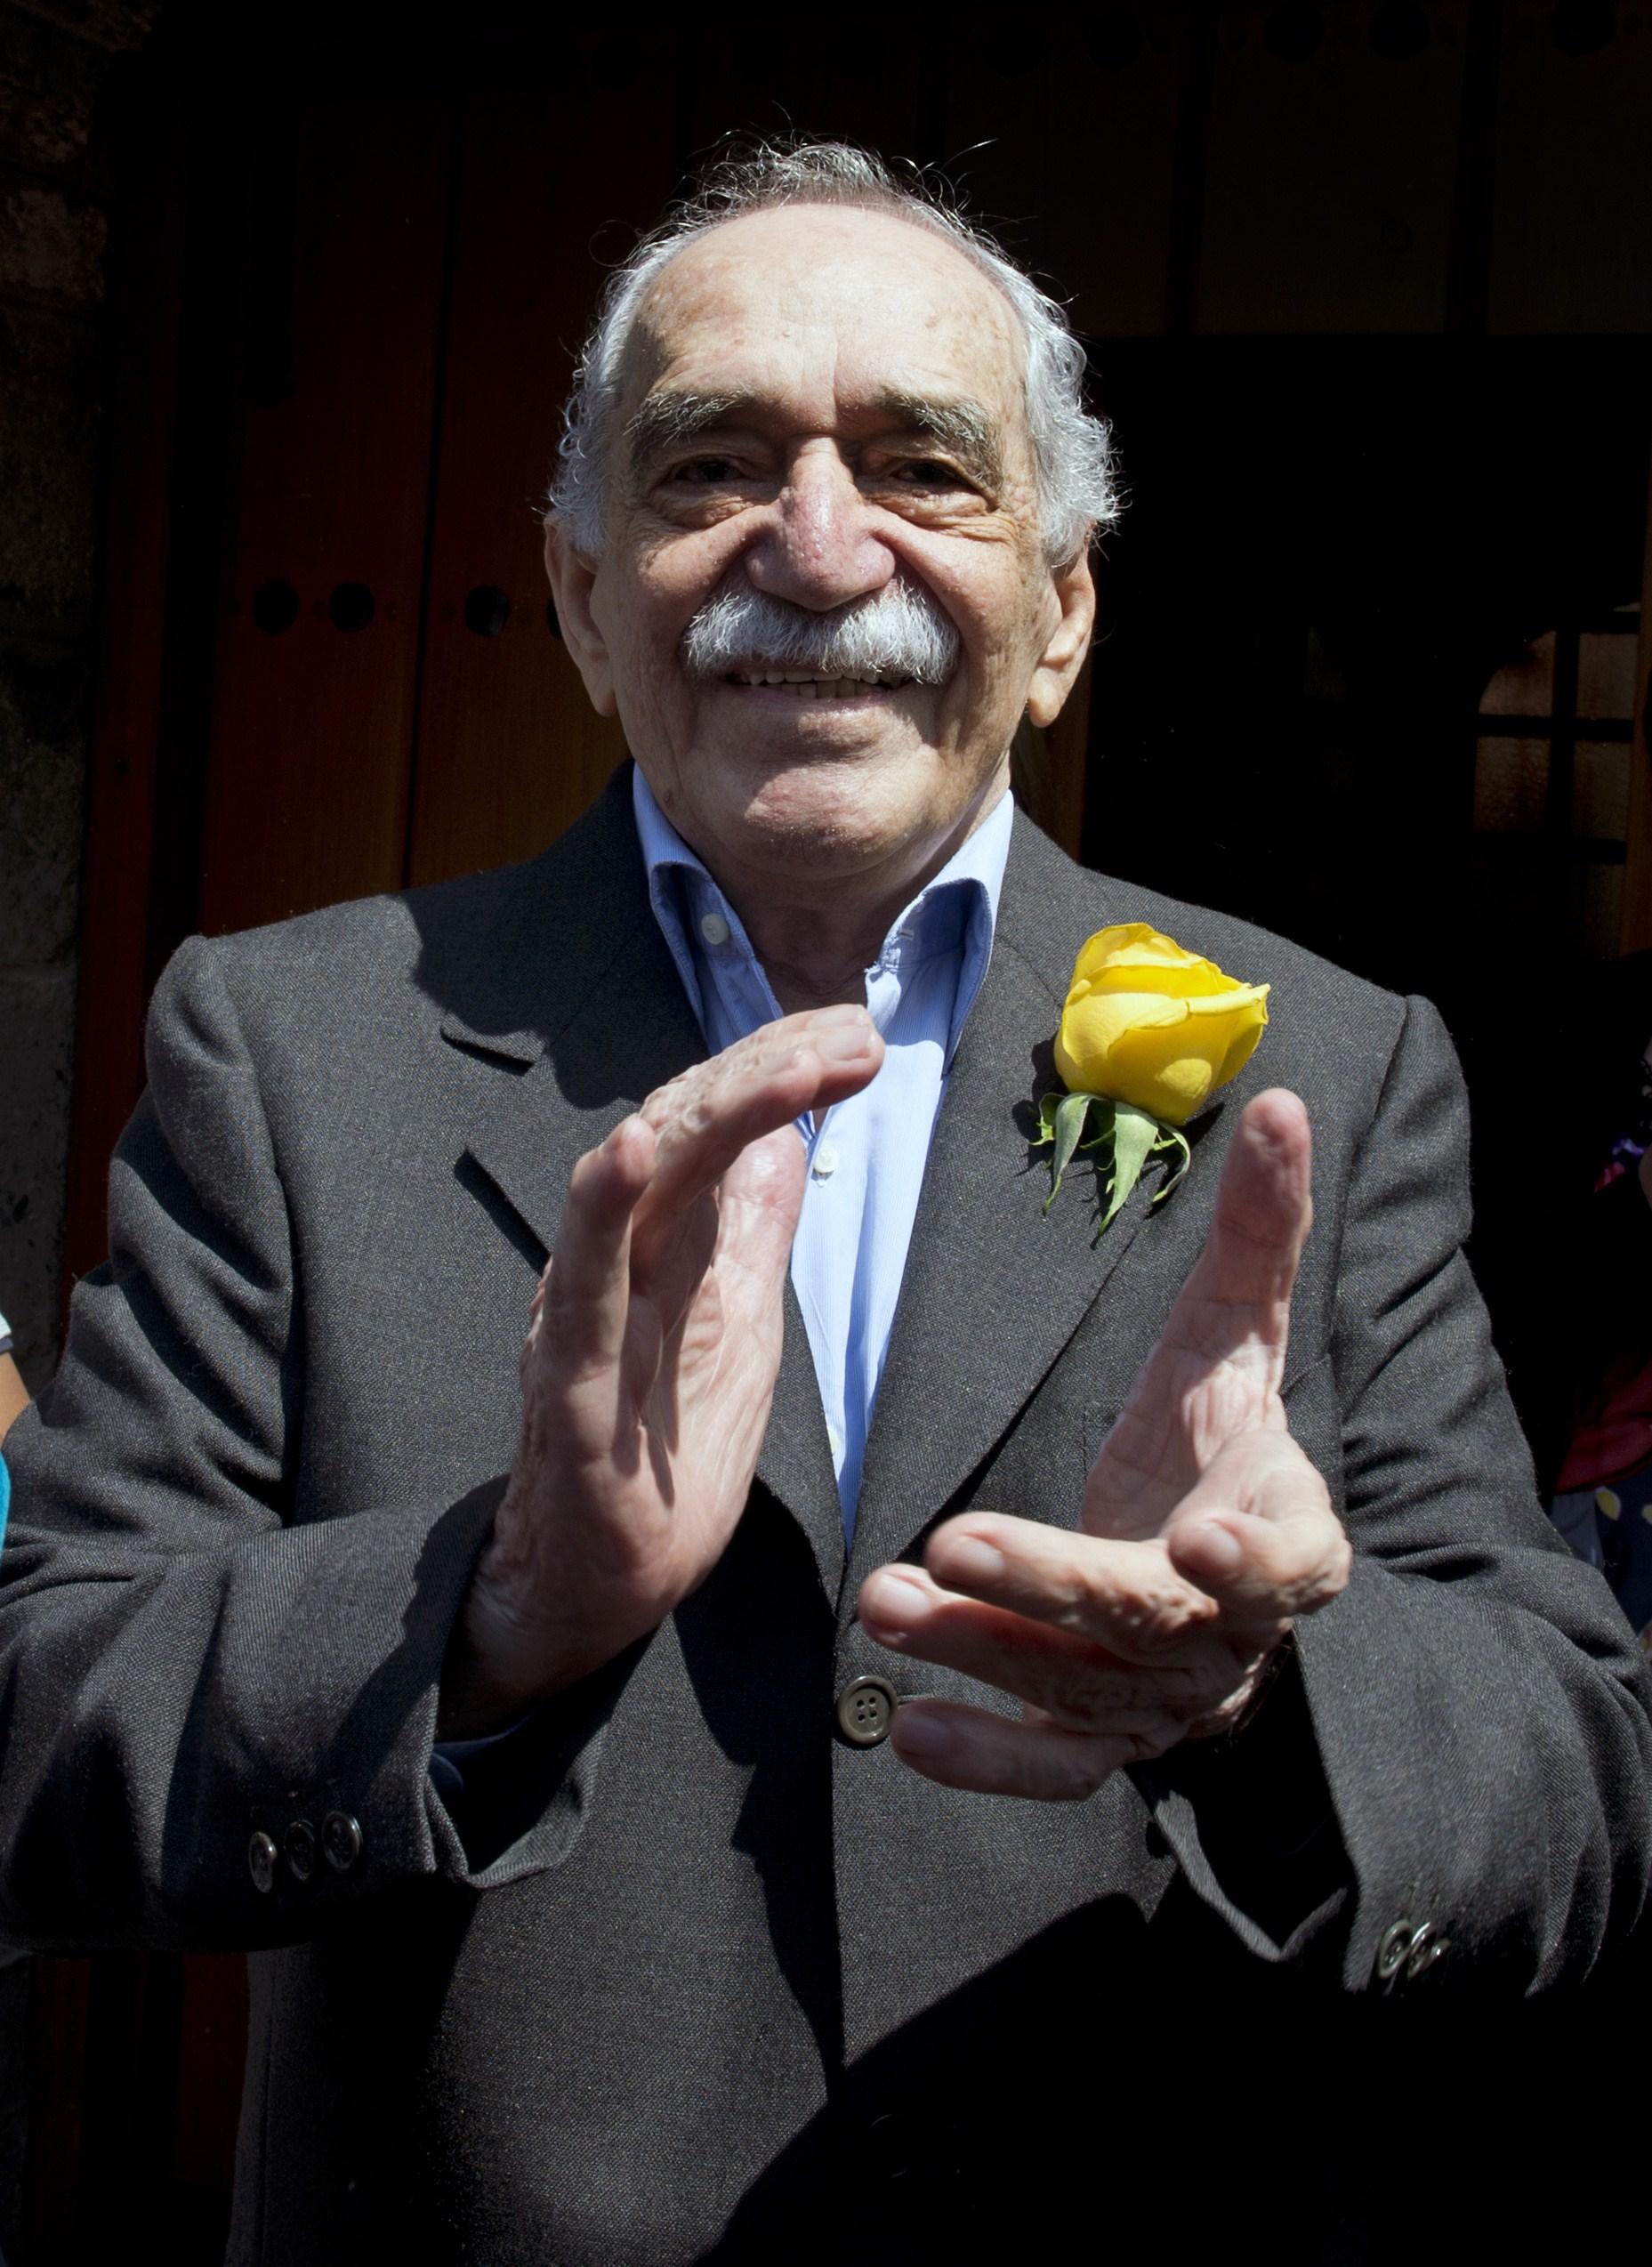 Doliu national in Columbia: Trupul neinsufletit al lui Garcia Marquez a fost incinerat. Familia nu stie ce sa faca cu cenusa